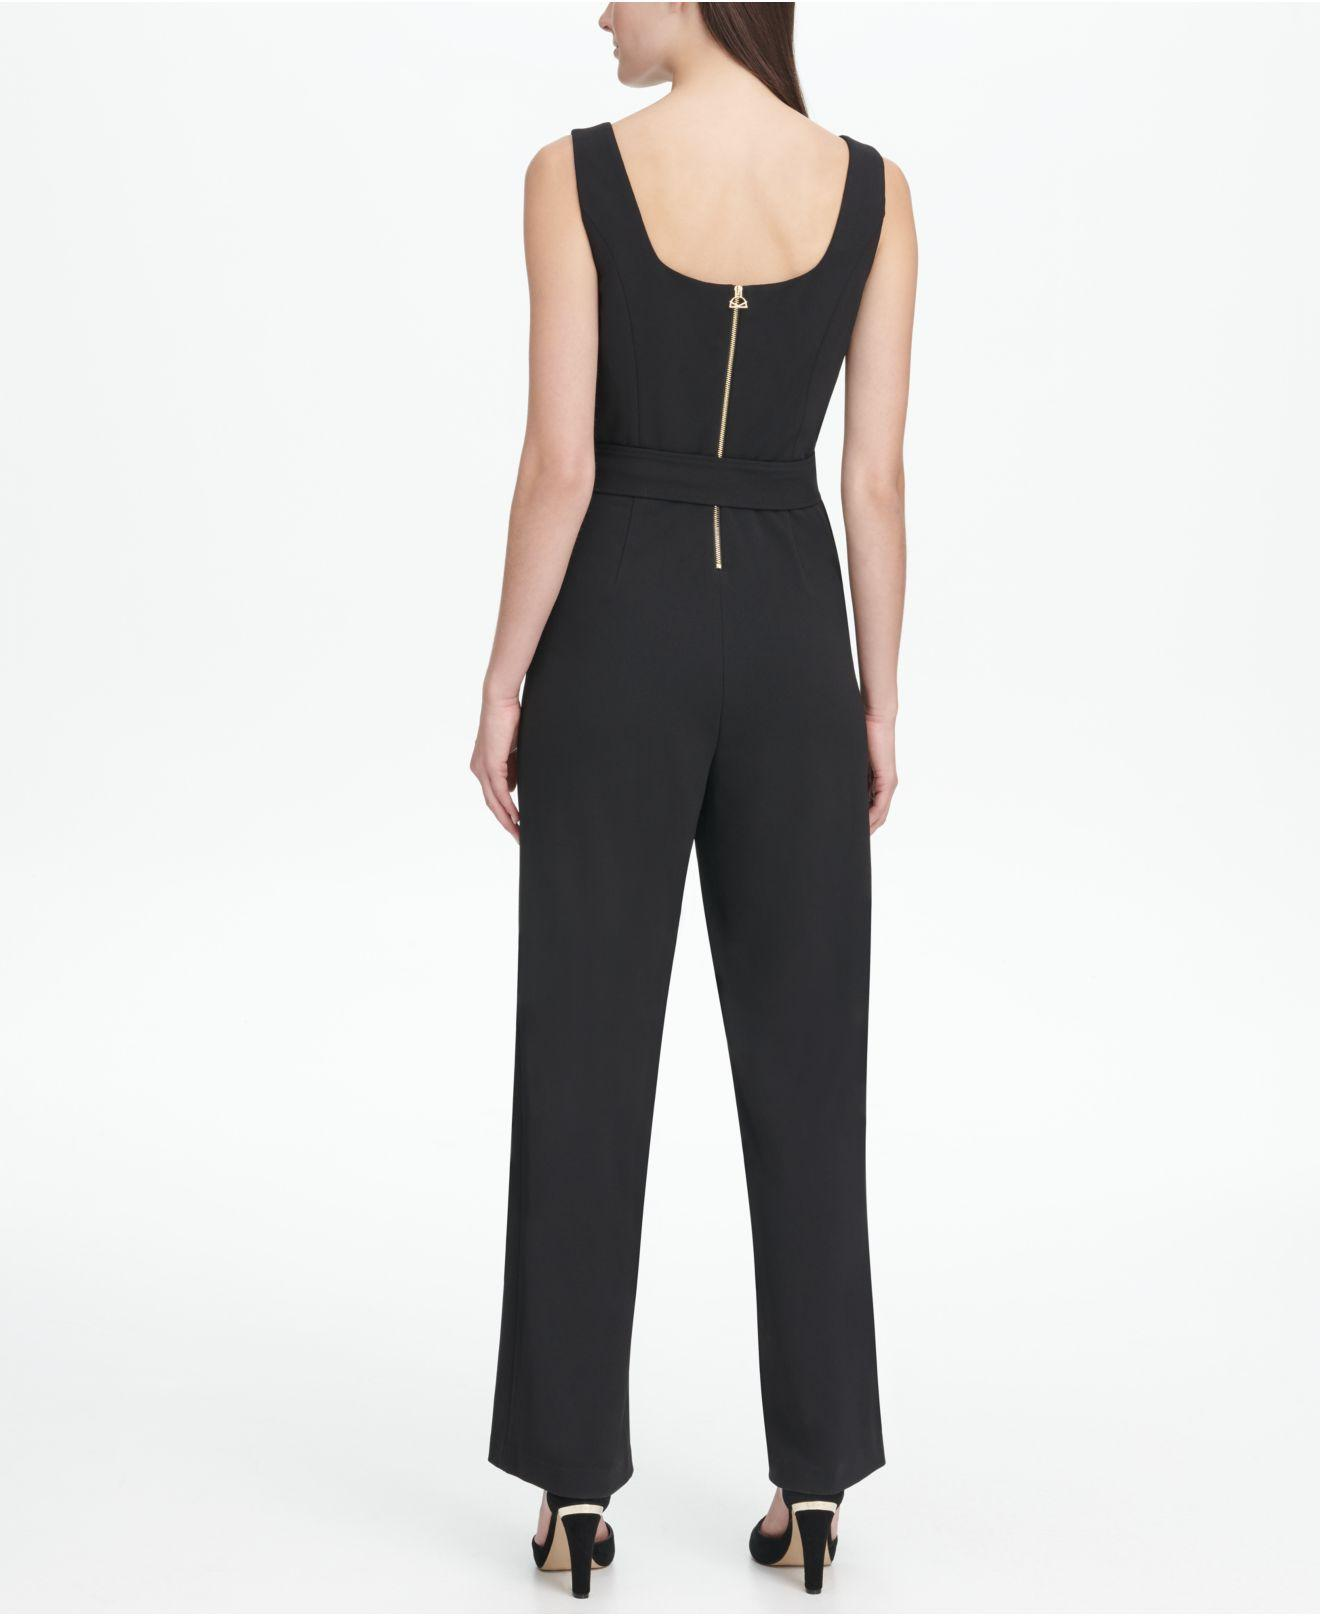 22fffaad761 Lyst - DKNY Square Neck Self Belt Jumpsuit in Black